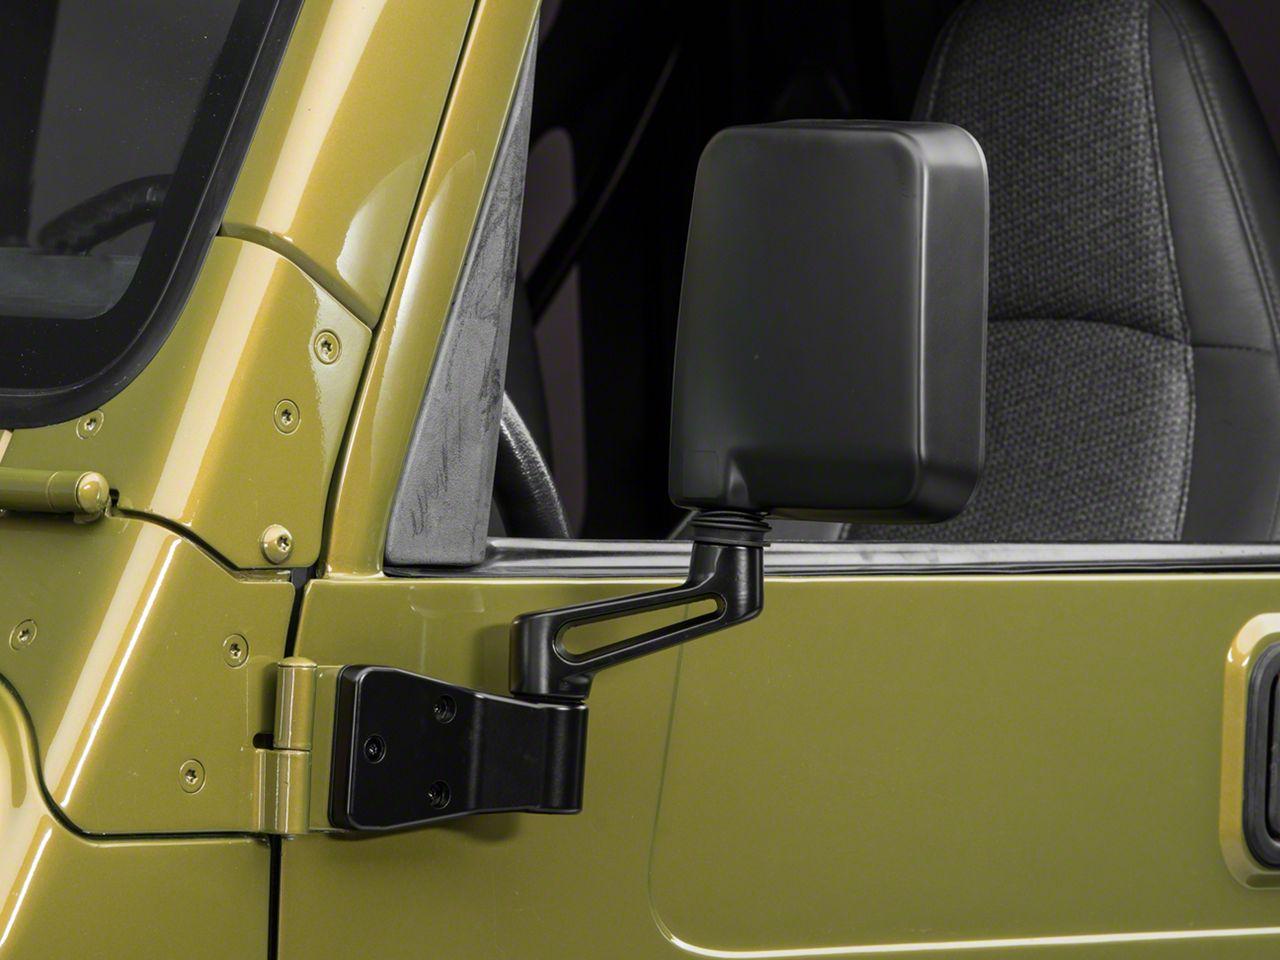 OPR Left Side Replacement Mirror - Black (87-02 Jeep Wrangler YJ & TJ)